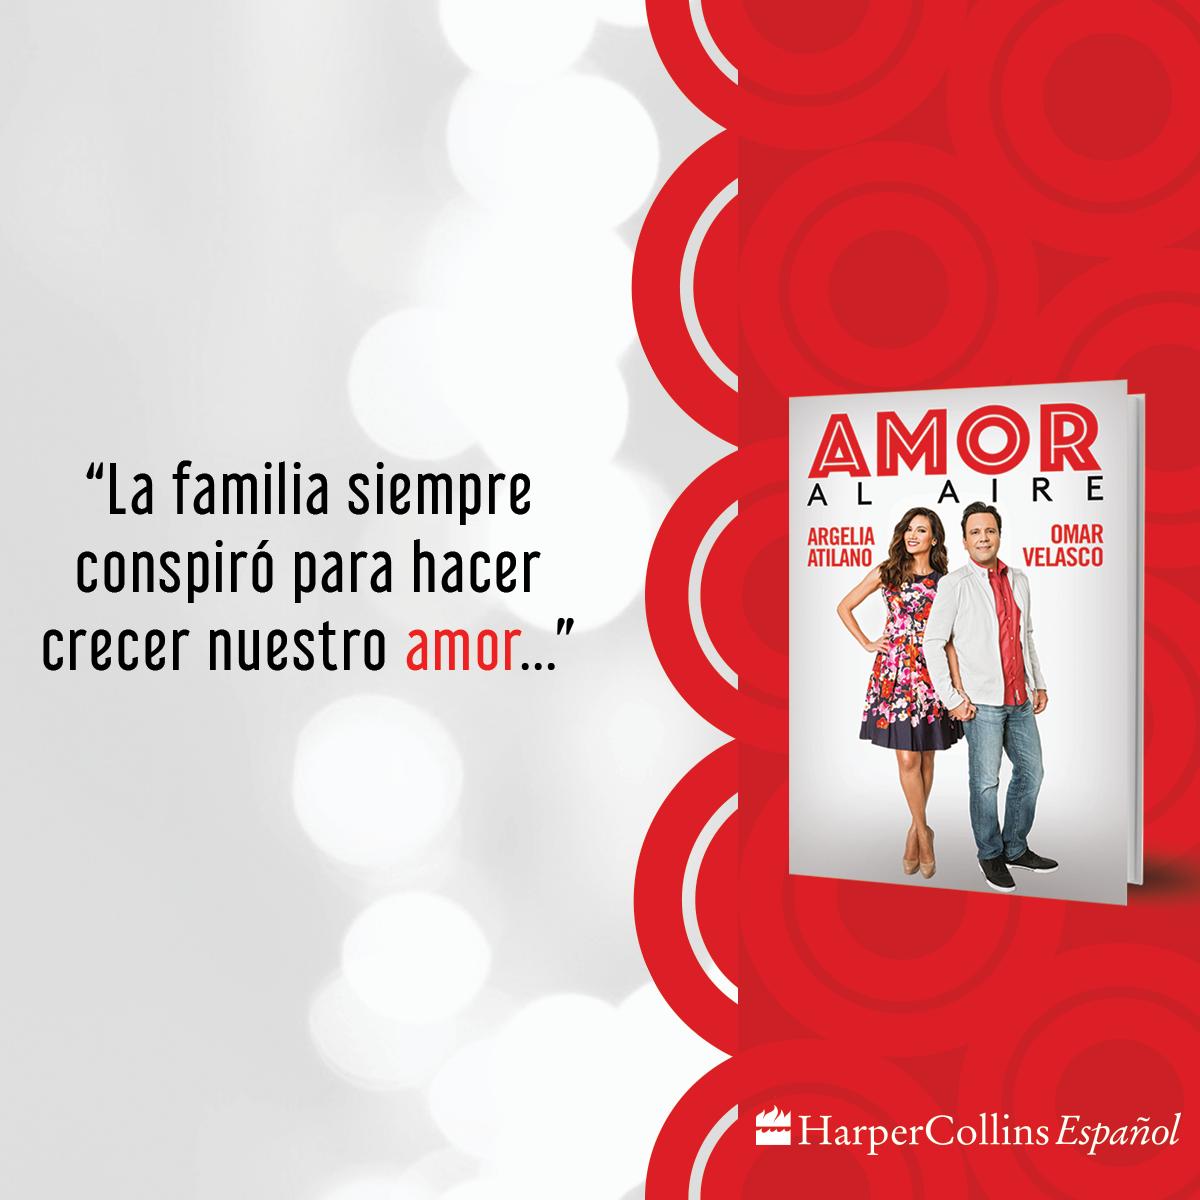 Las Frases Mas Romanticas De Amor Al Aire Amor 100 3 Univision